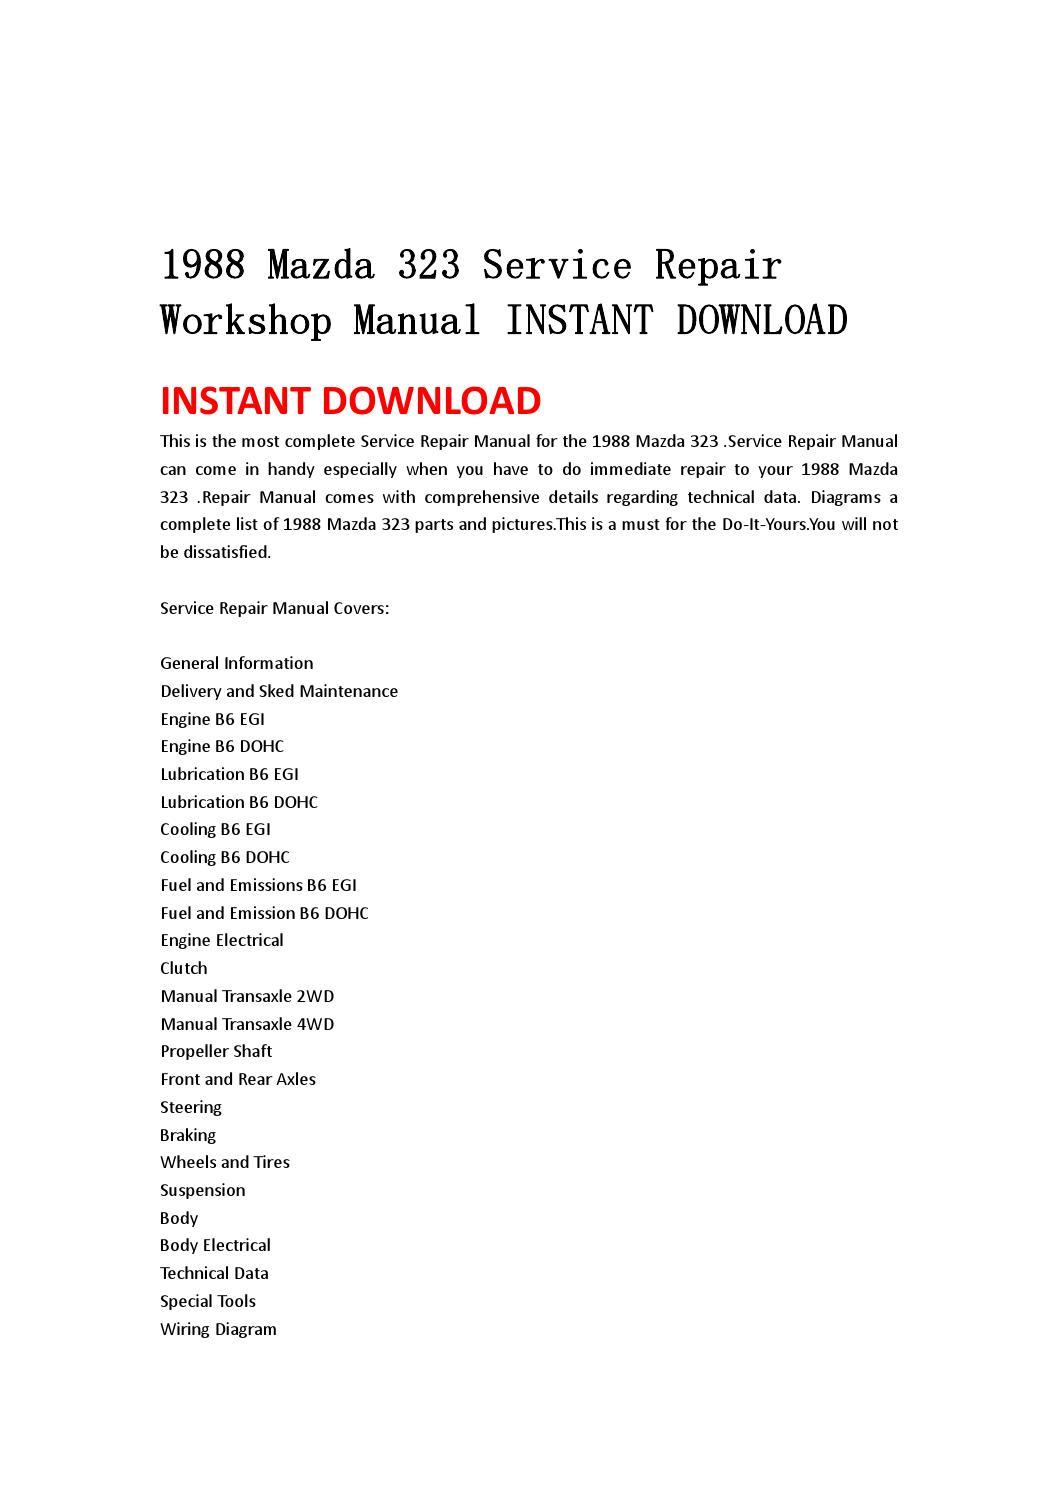 1988 Mazda 323 Service Repair Workshop Manual Instant Download By Kmjsehfn Mksejfn